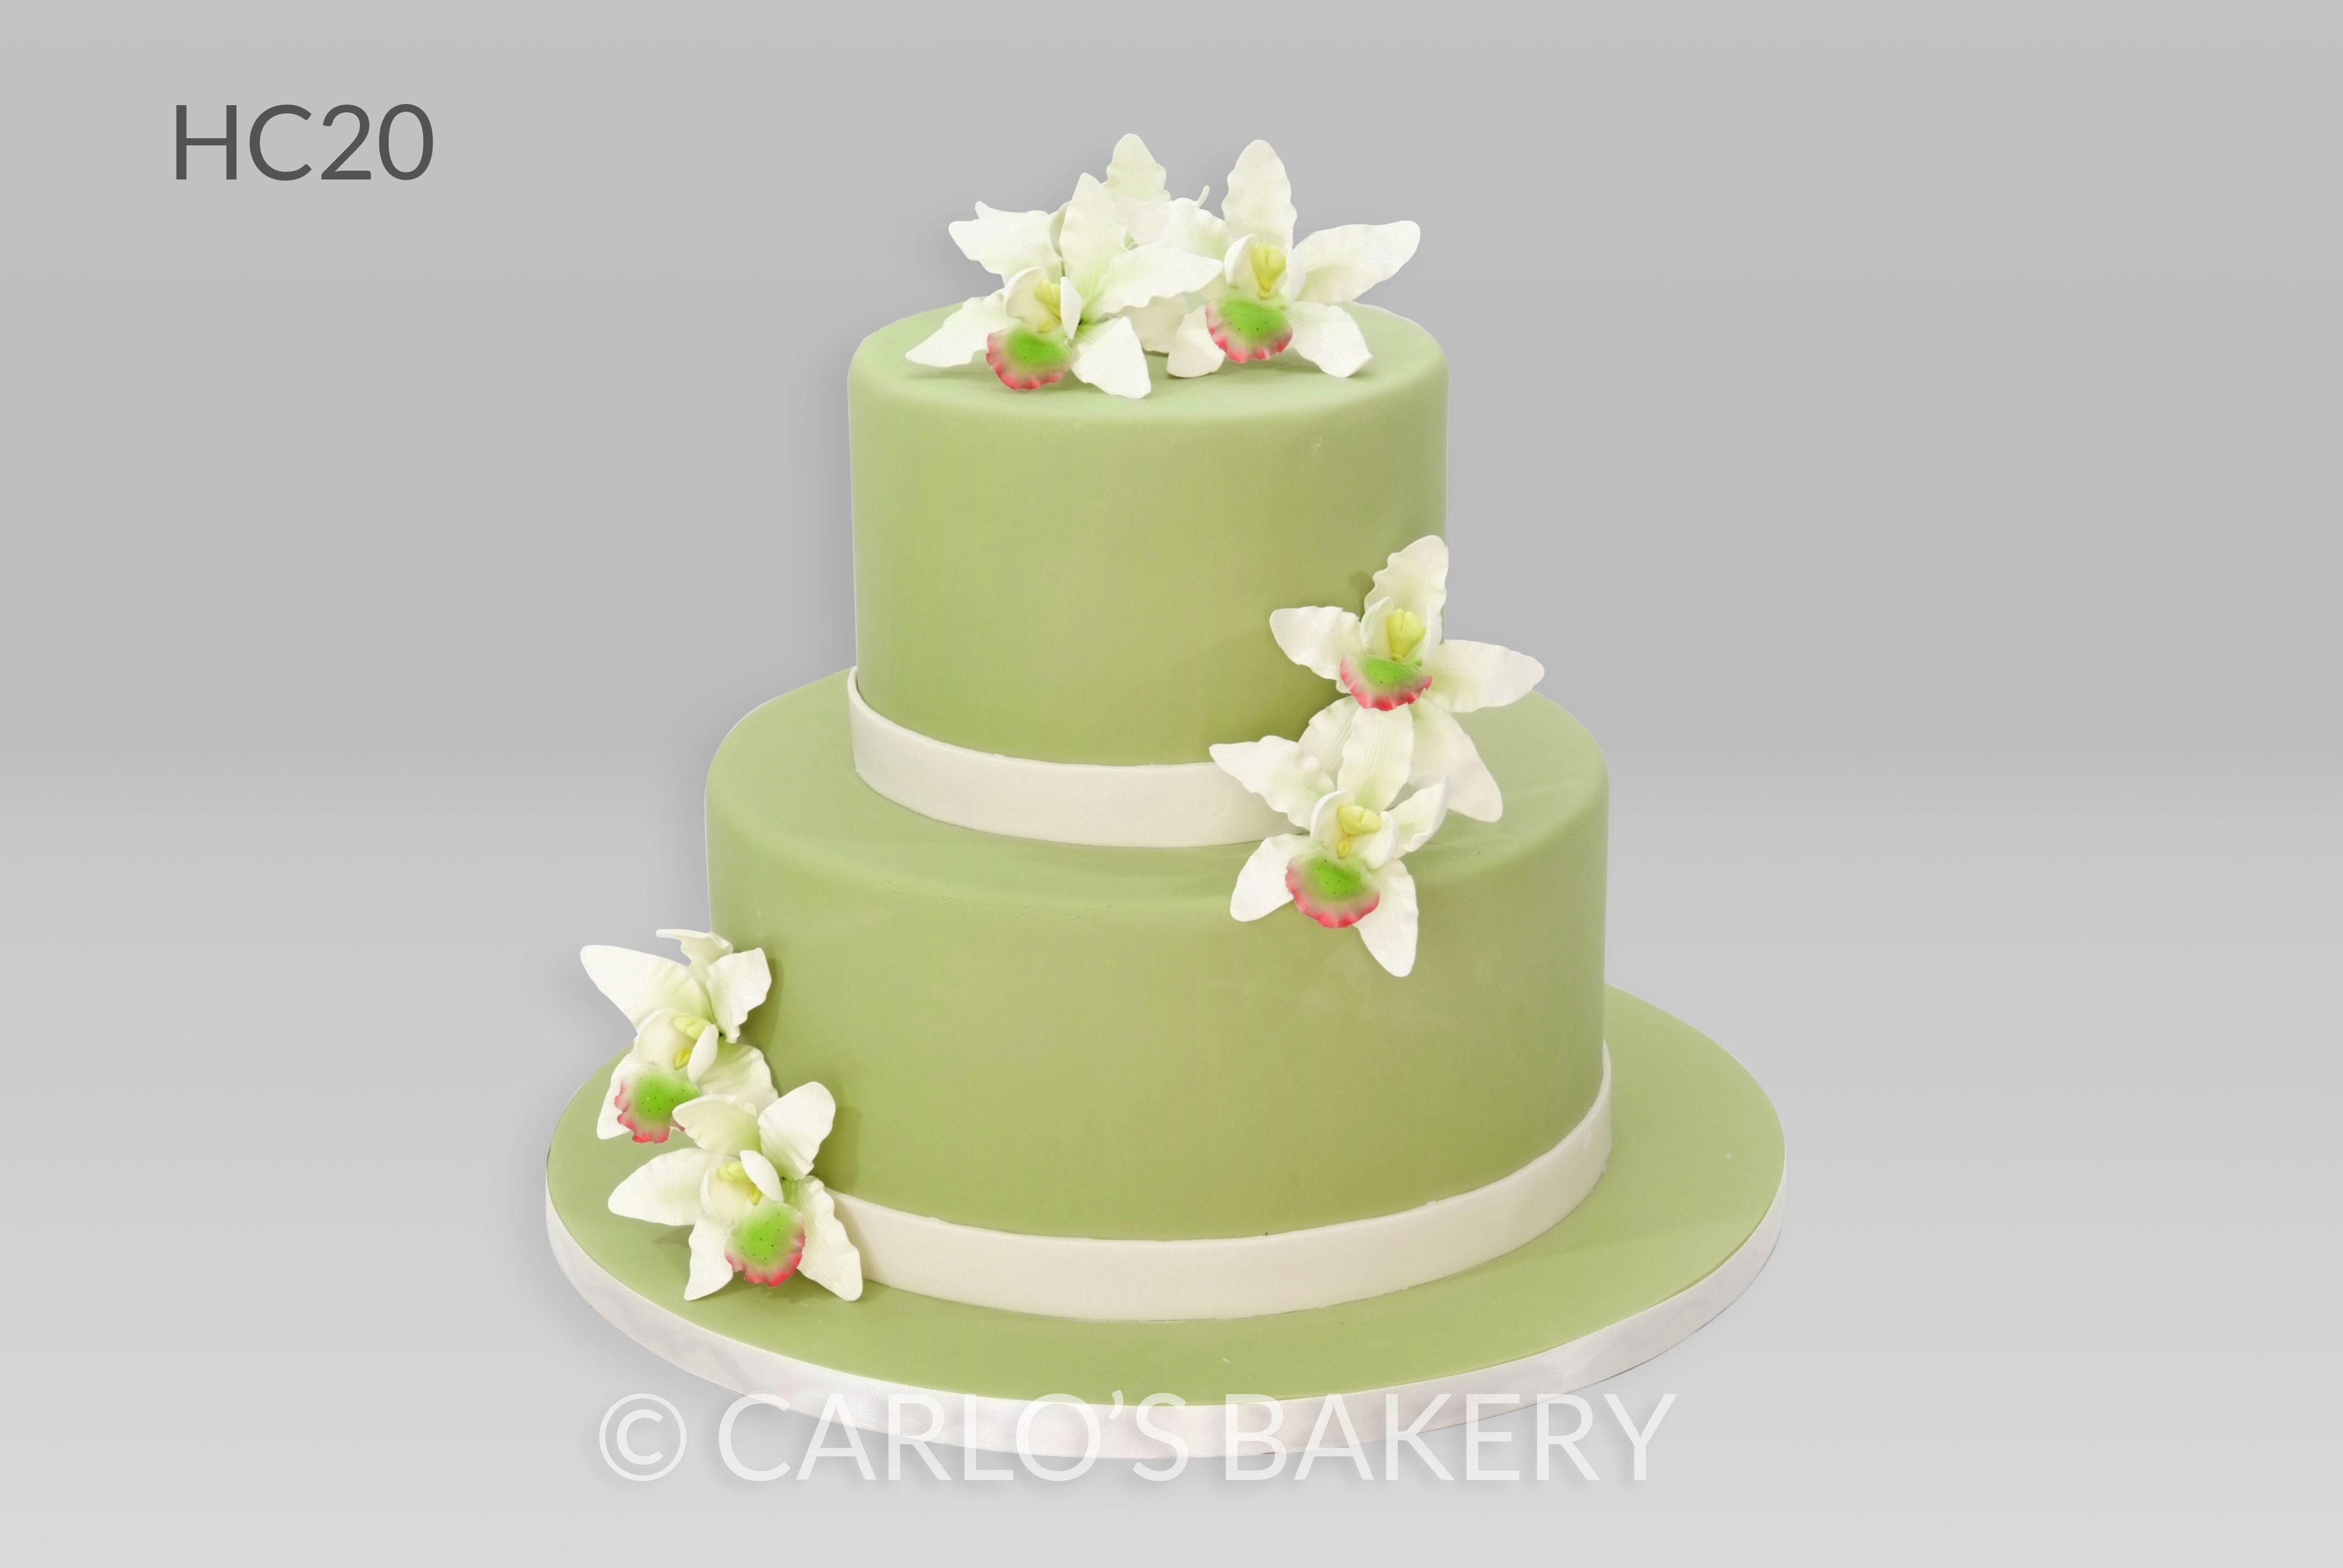 Carlo'S Bakery Wedding Cakes  Carlo s Bakery Hall Wedding Cake Designs